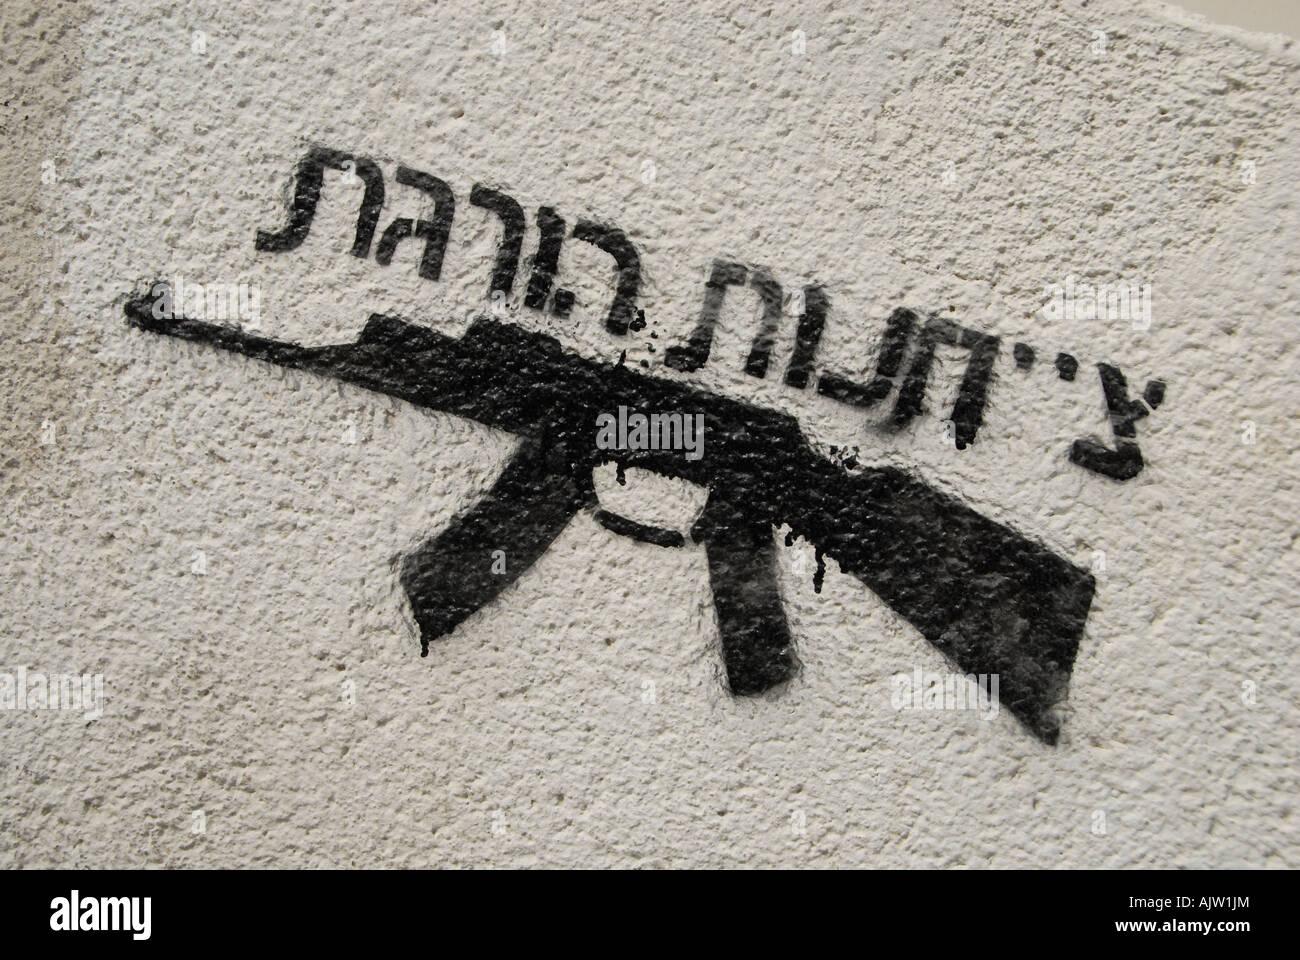 La guerre anti graffitis illustrant la mitrailleuse Kalachnikov AK-47 avec une phrase écrite en hébreu Photo Stock